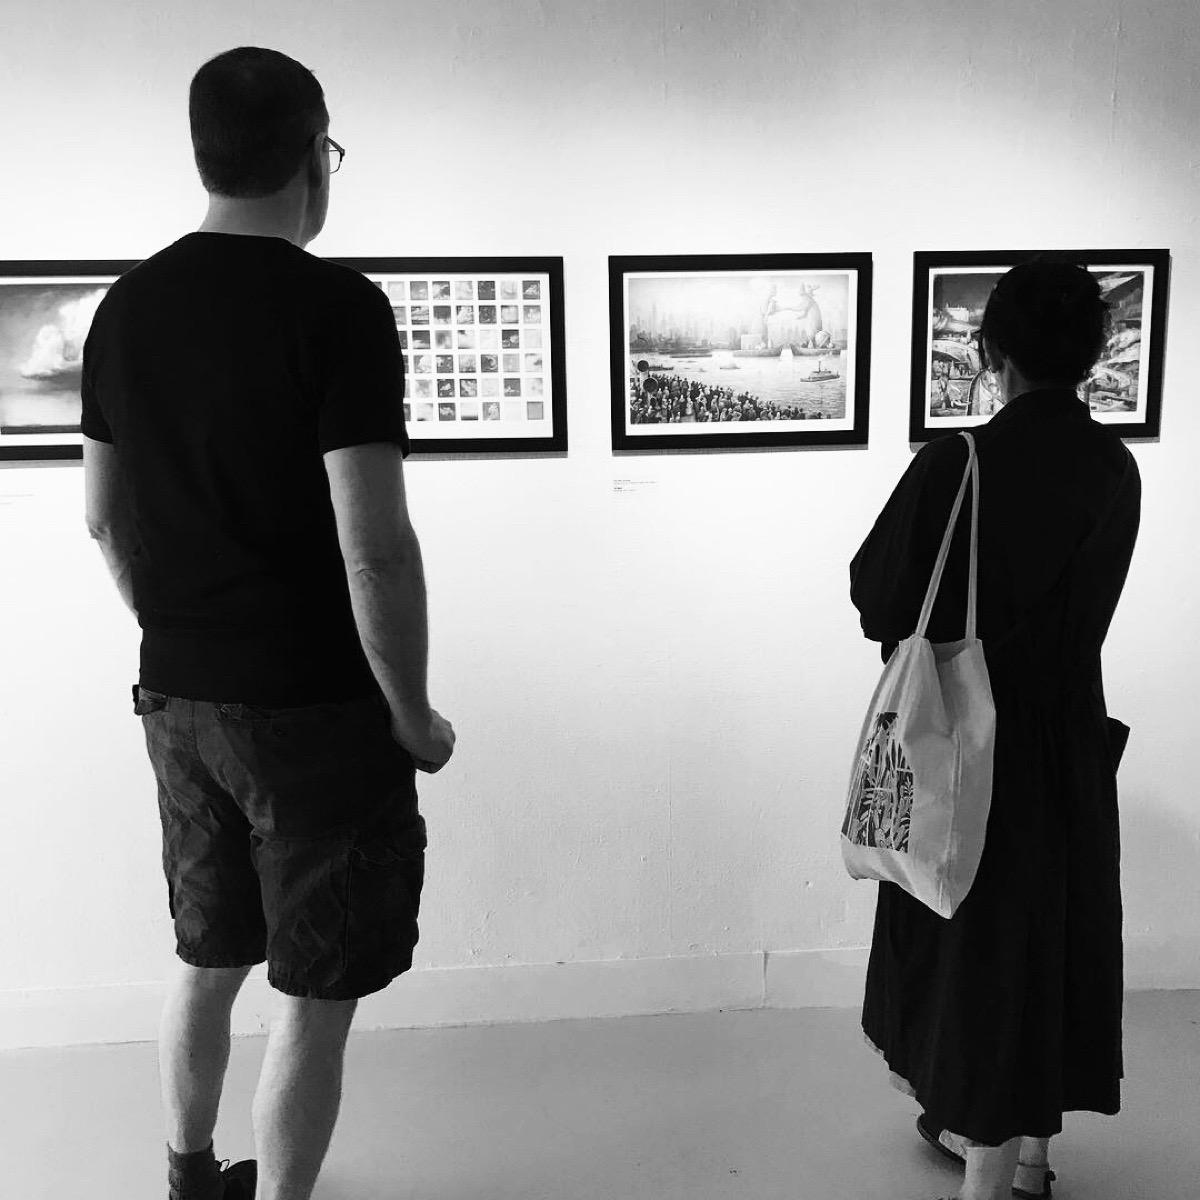 sean tan's art exhibition